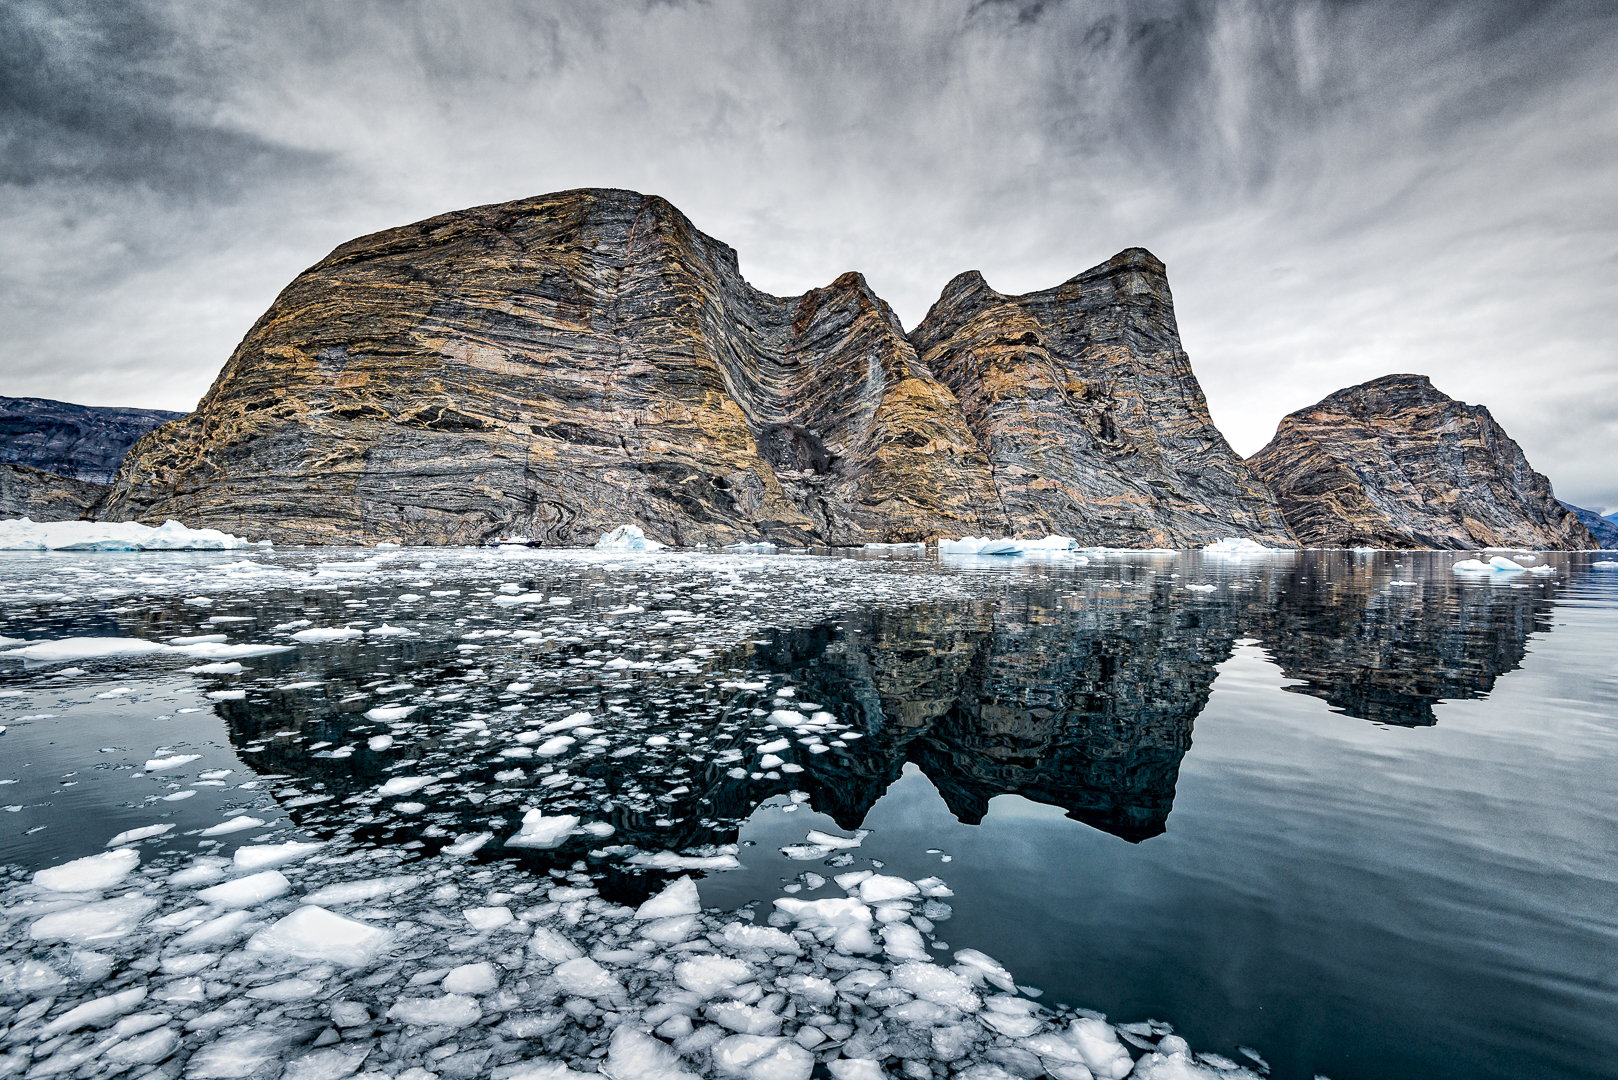 Polar Pioneer & Rocks © Michael Smyth